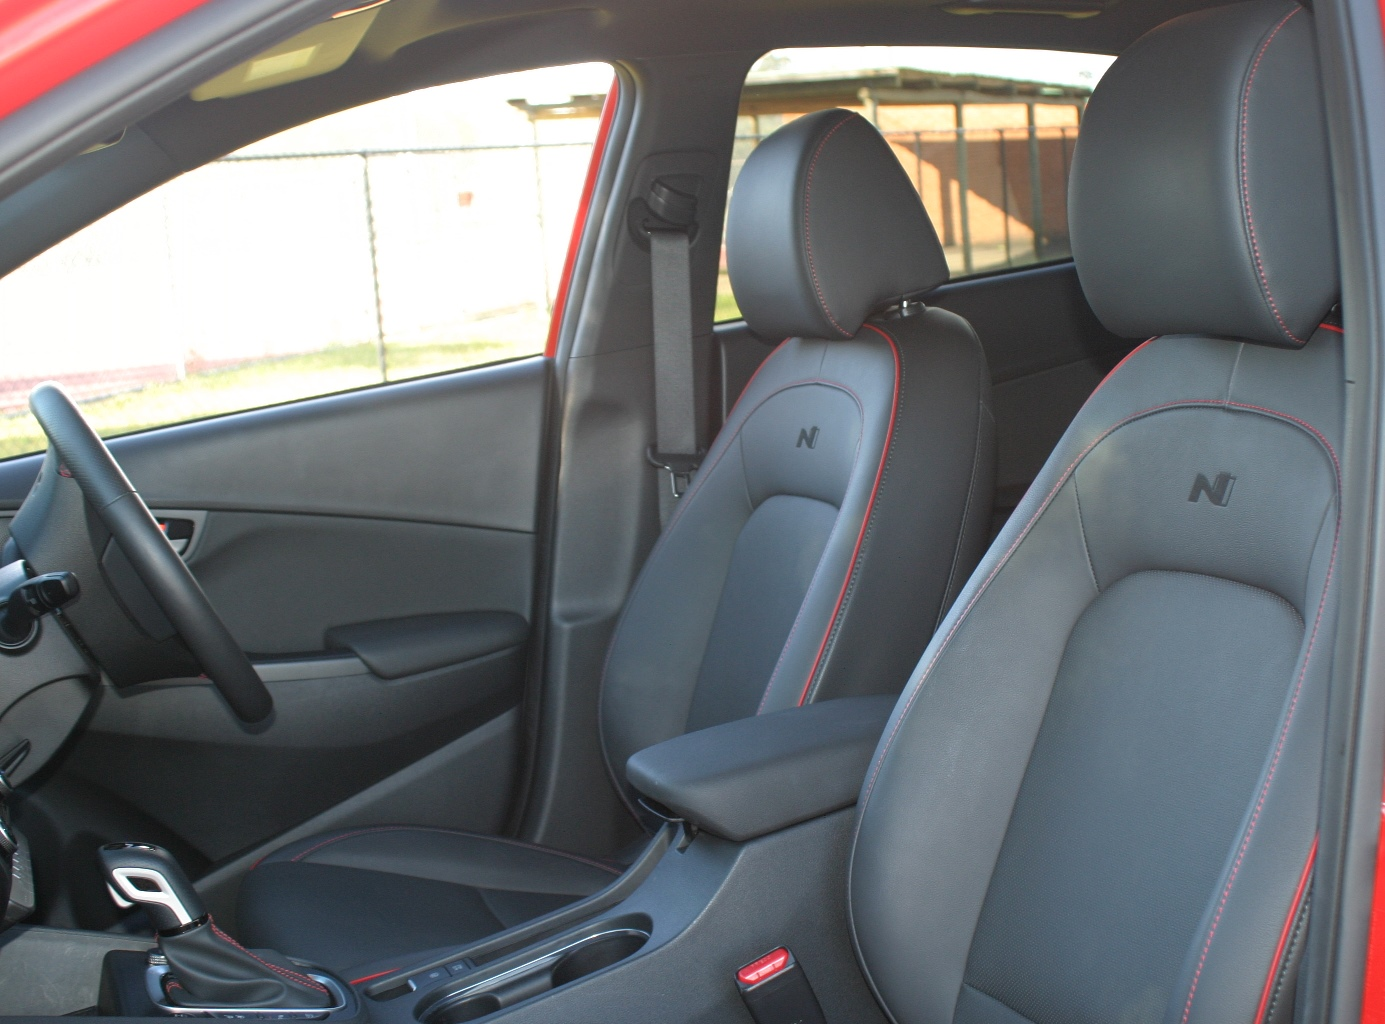 Hyundai Kona N Line Premium front seats